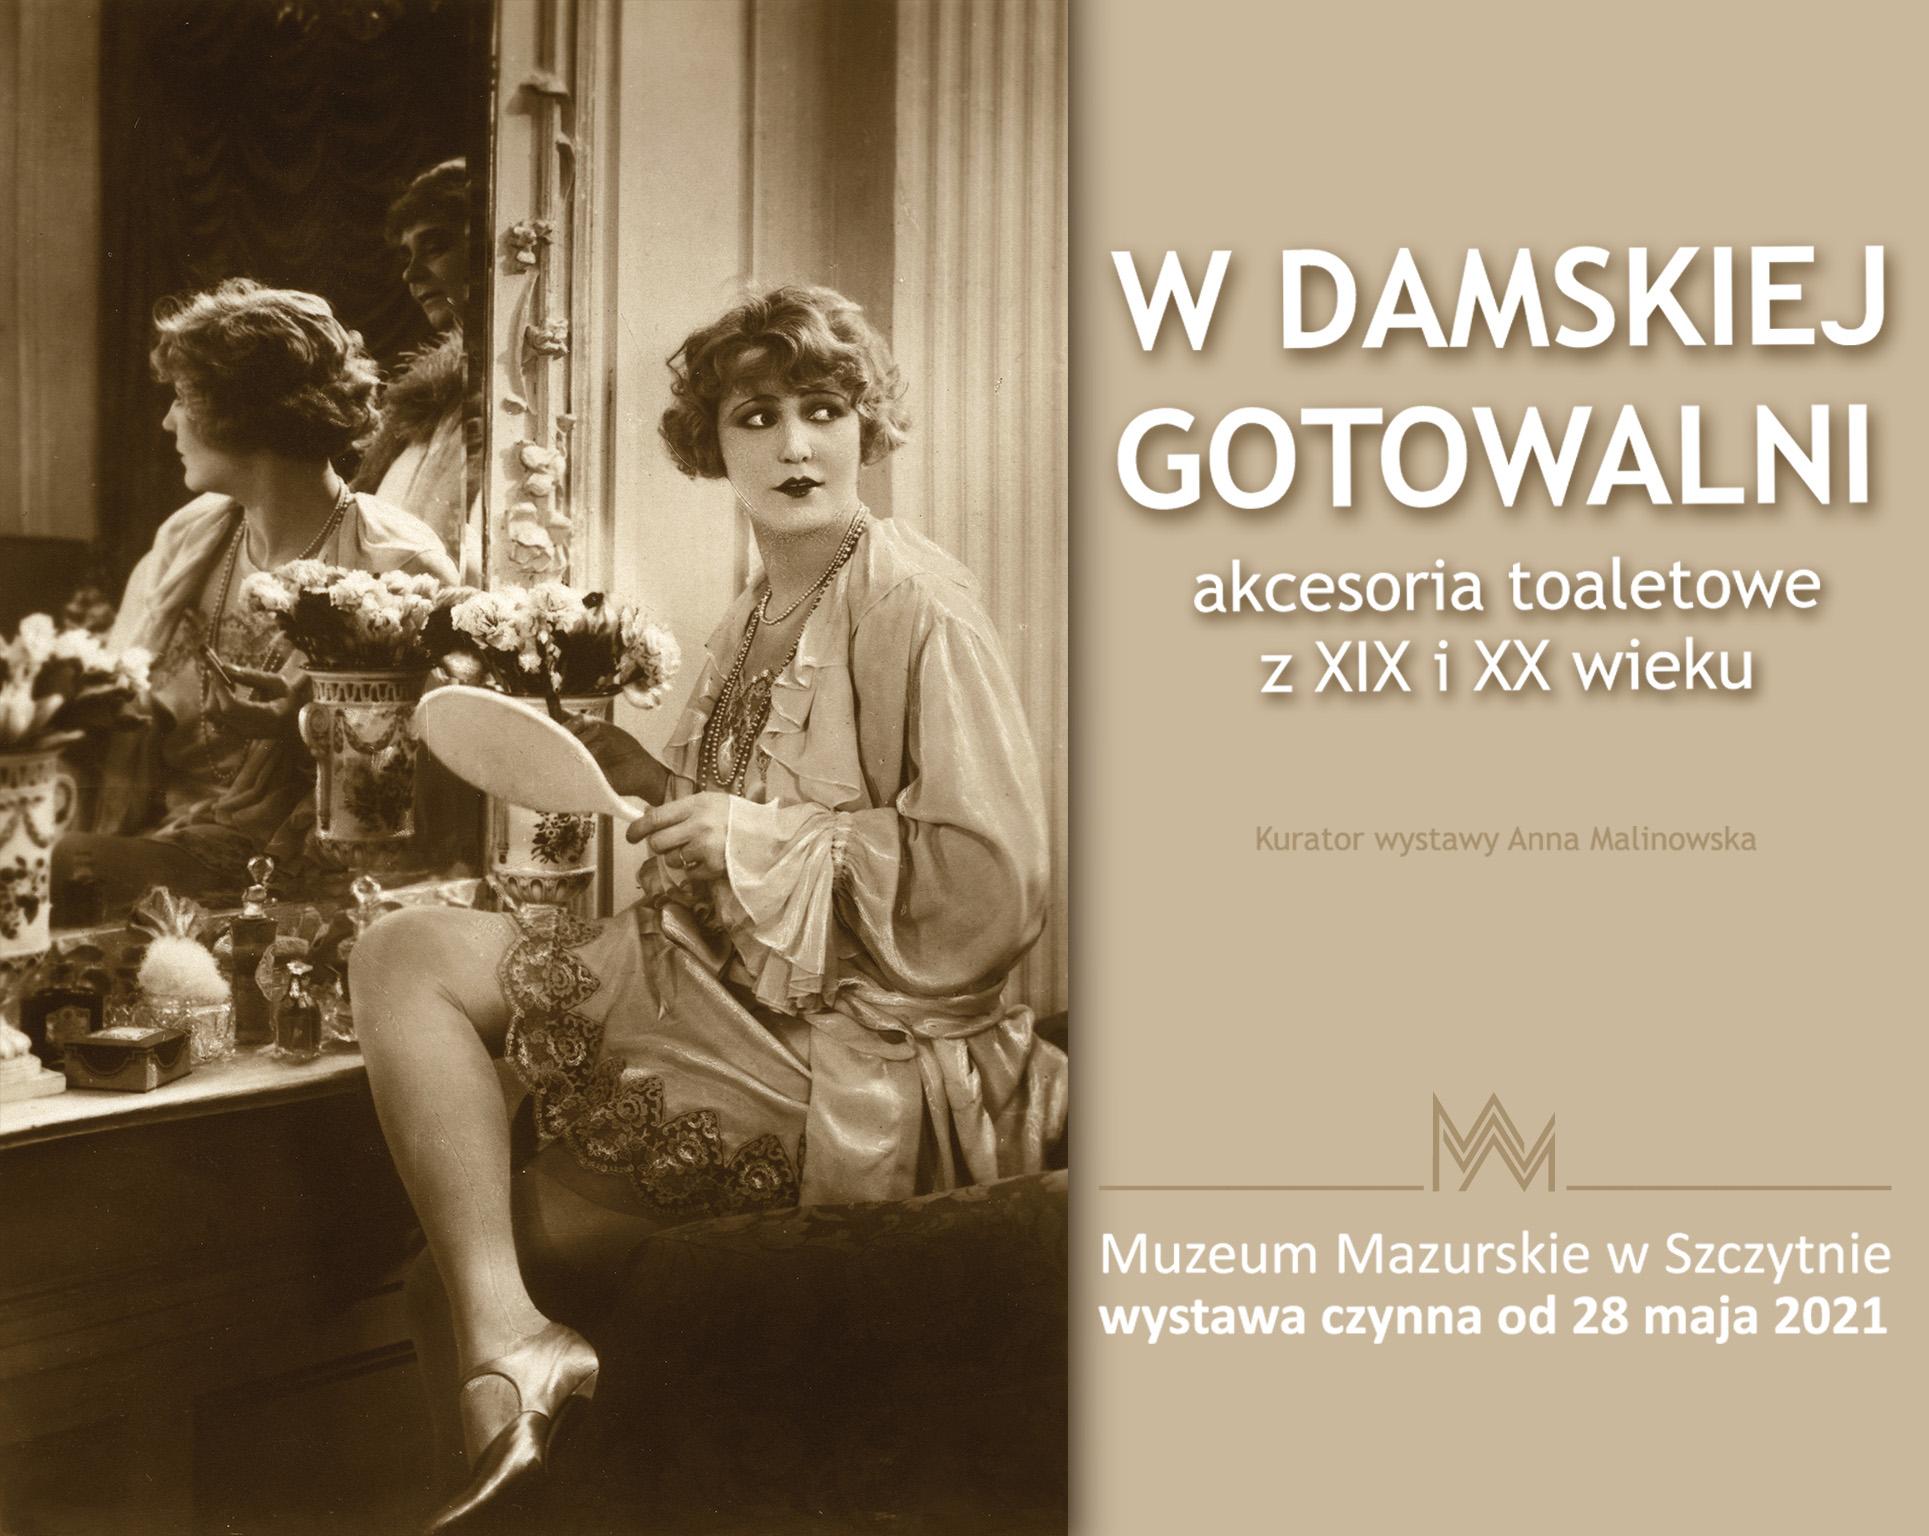 https://m.wmwm.pl/2021/05/orig/damska-gotowalnia-baner-www1-6978.jpg